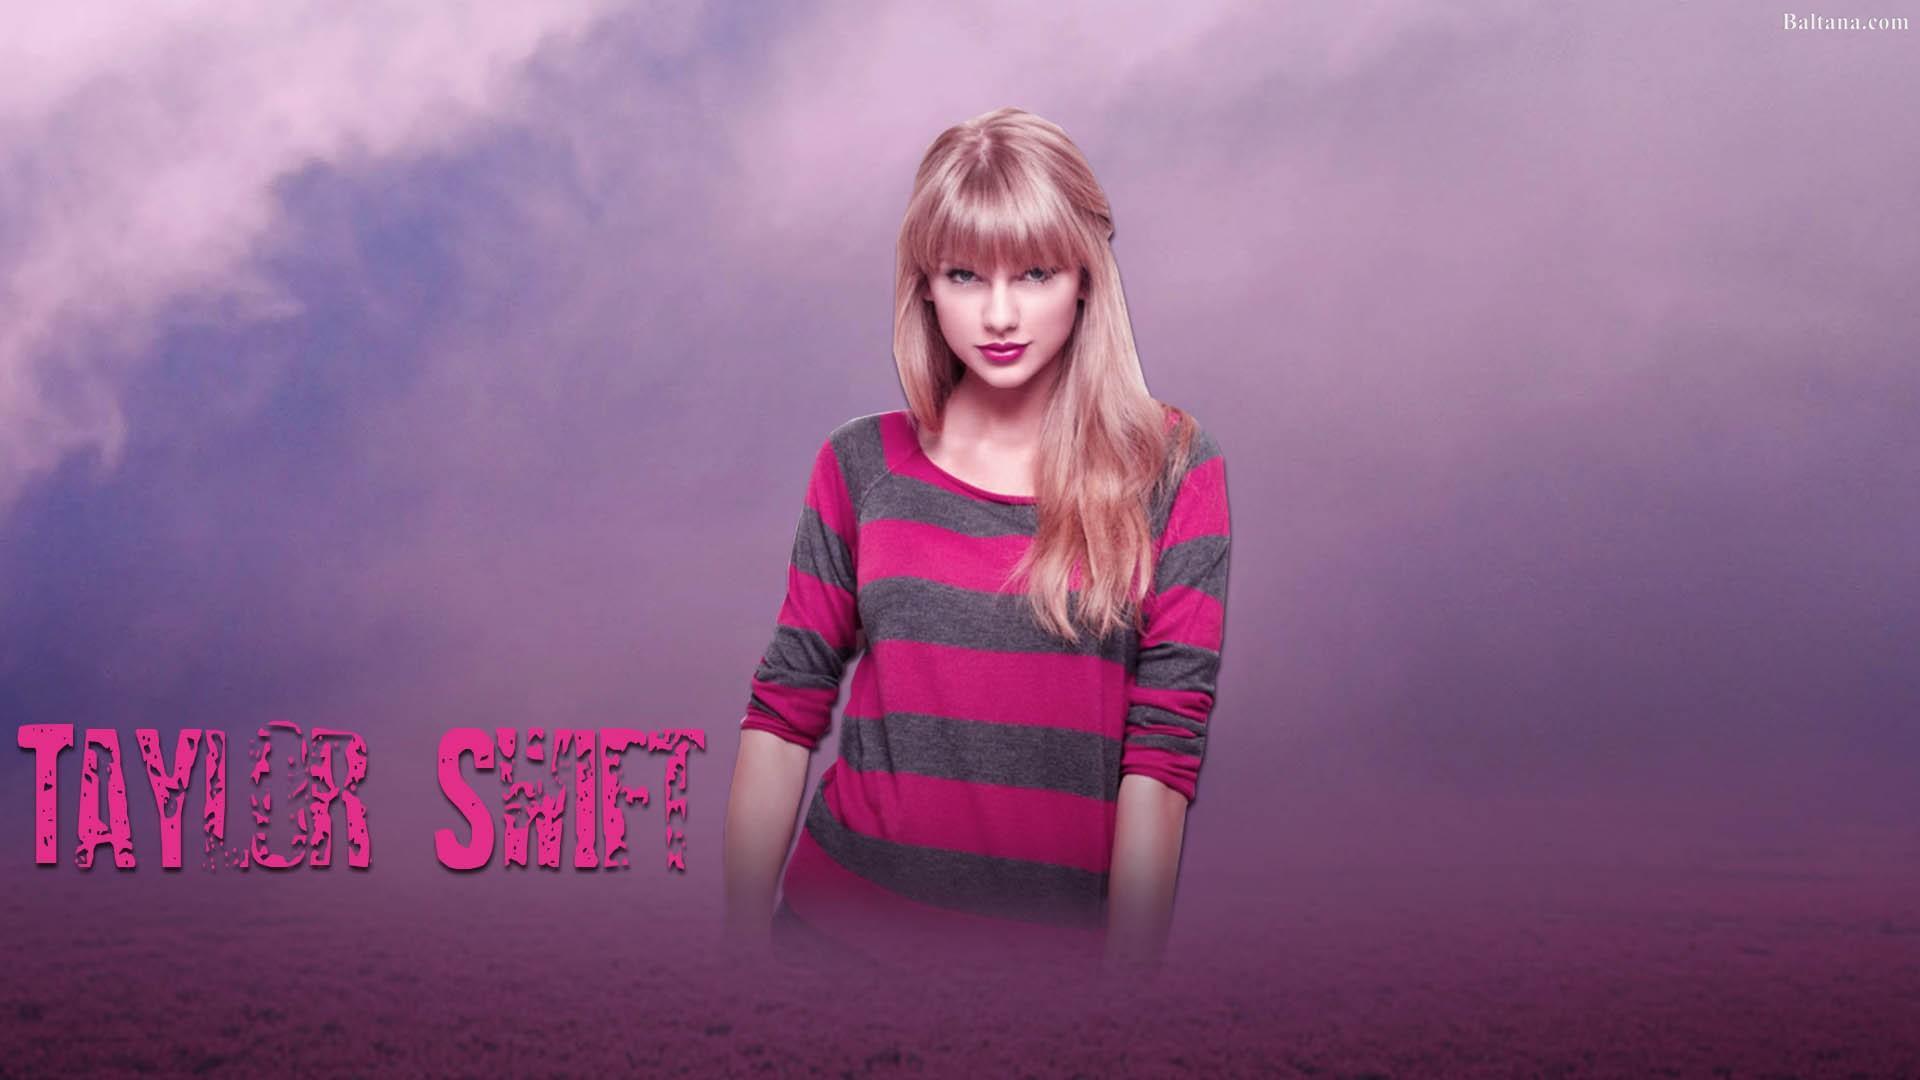 Taylor Swift Desktop Wallpapers Wallpaper Cave